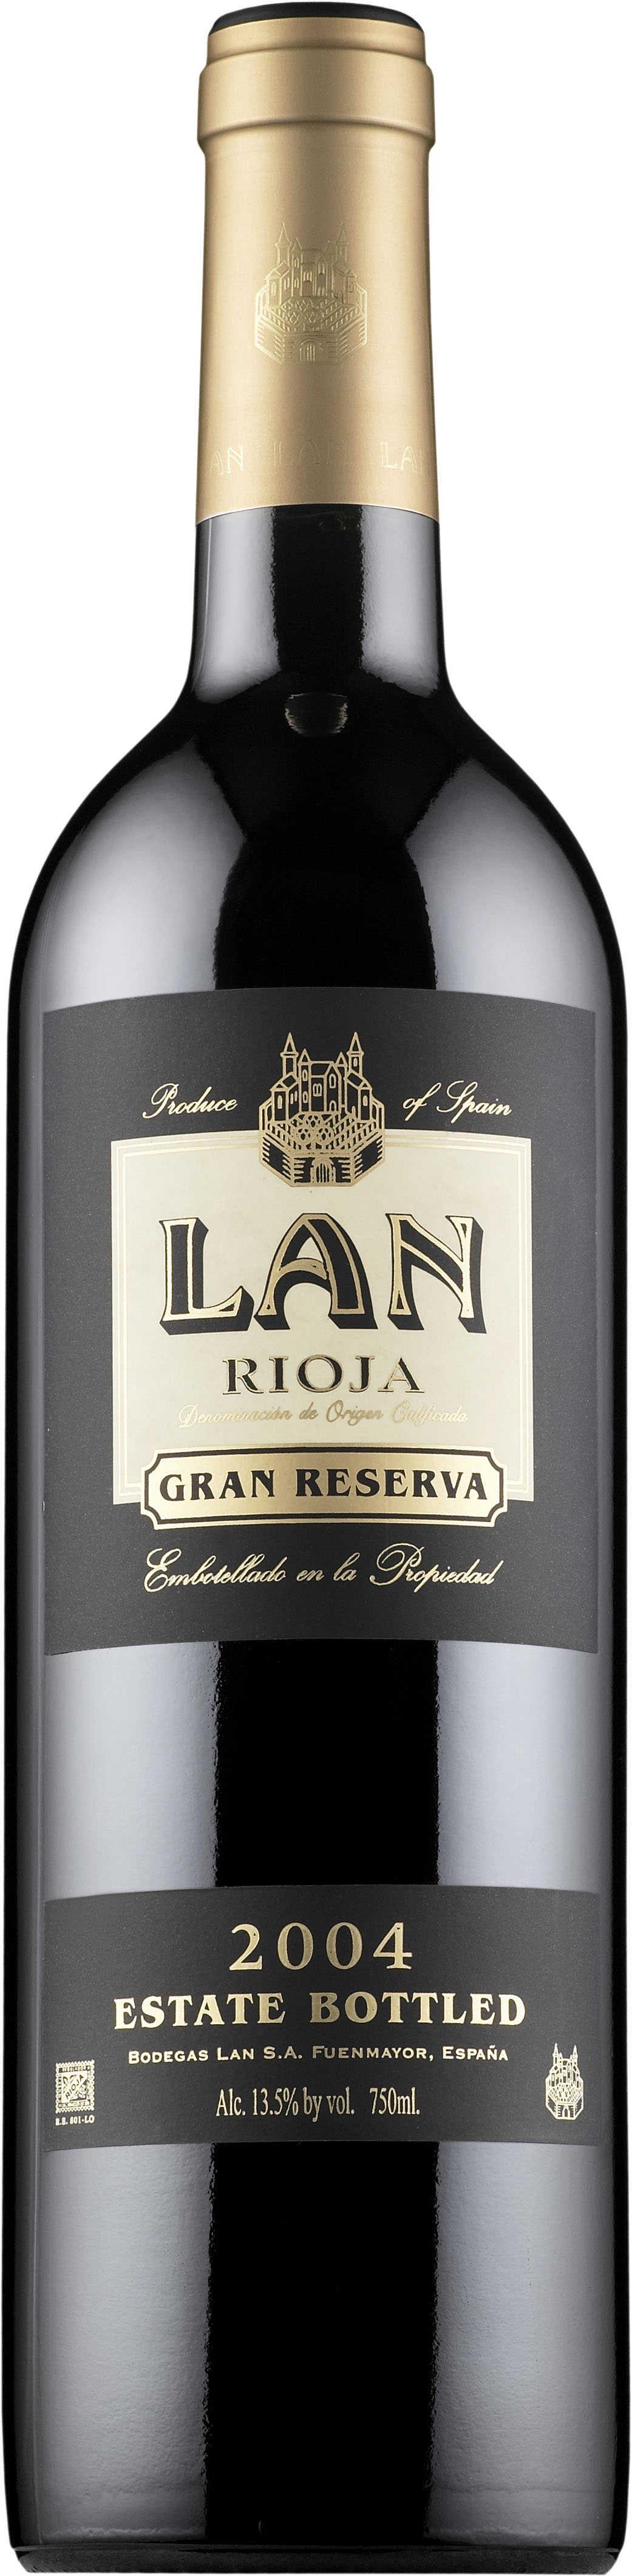 LAN Gran Reserva